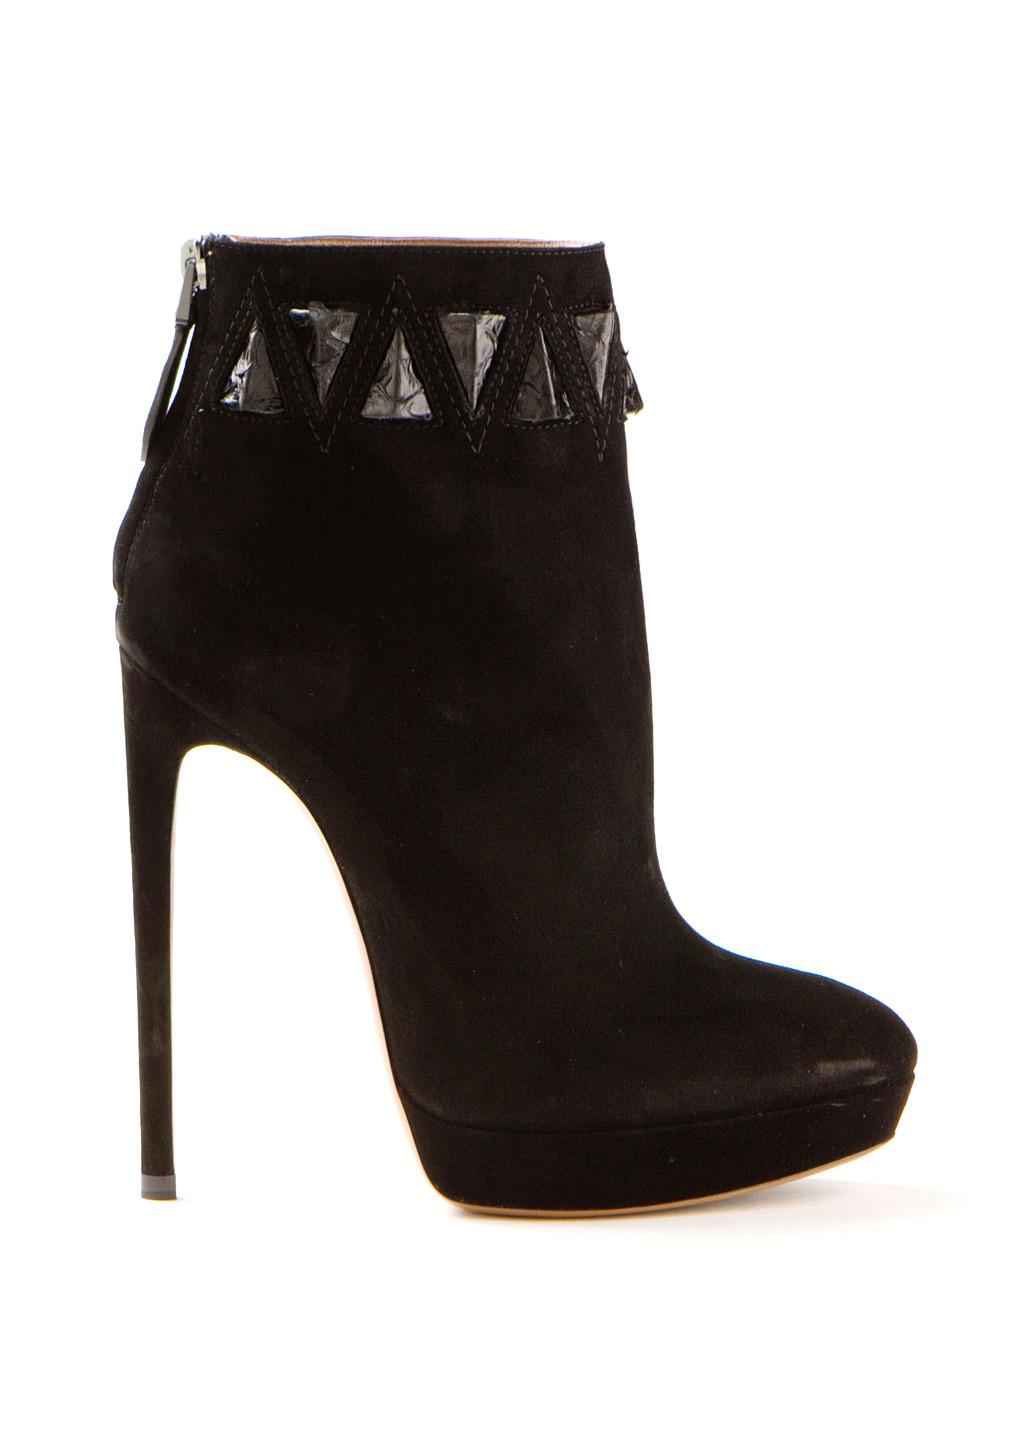 Azzedine alaïa ankle boots :: azzedine alaïa black chamois ankle boots embellished with python yokes